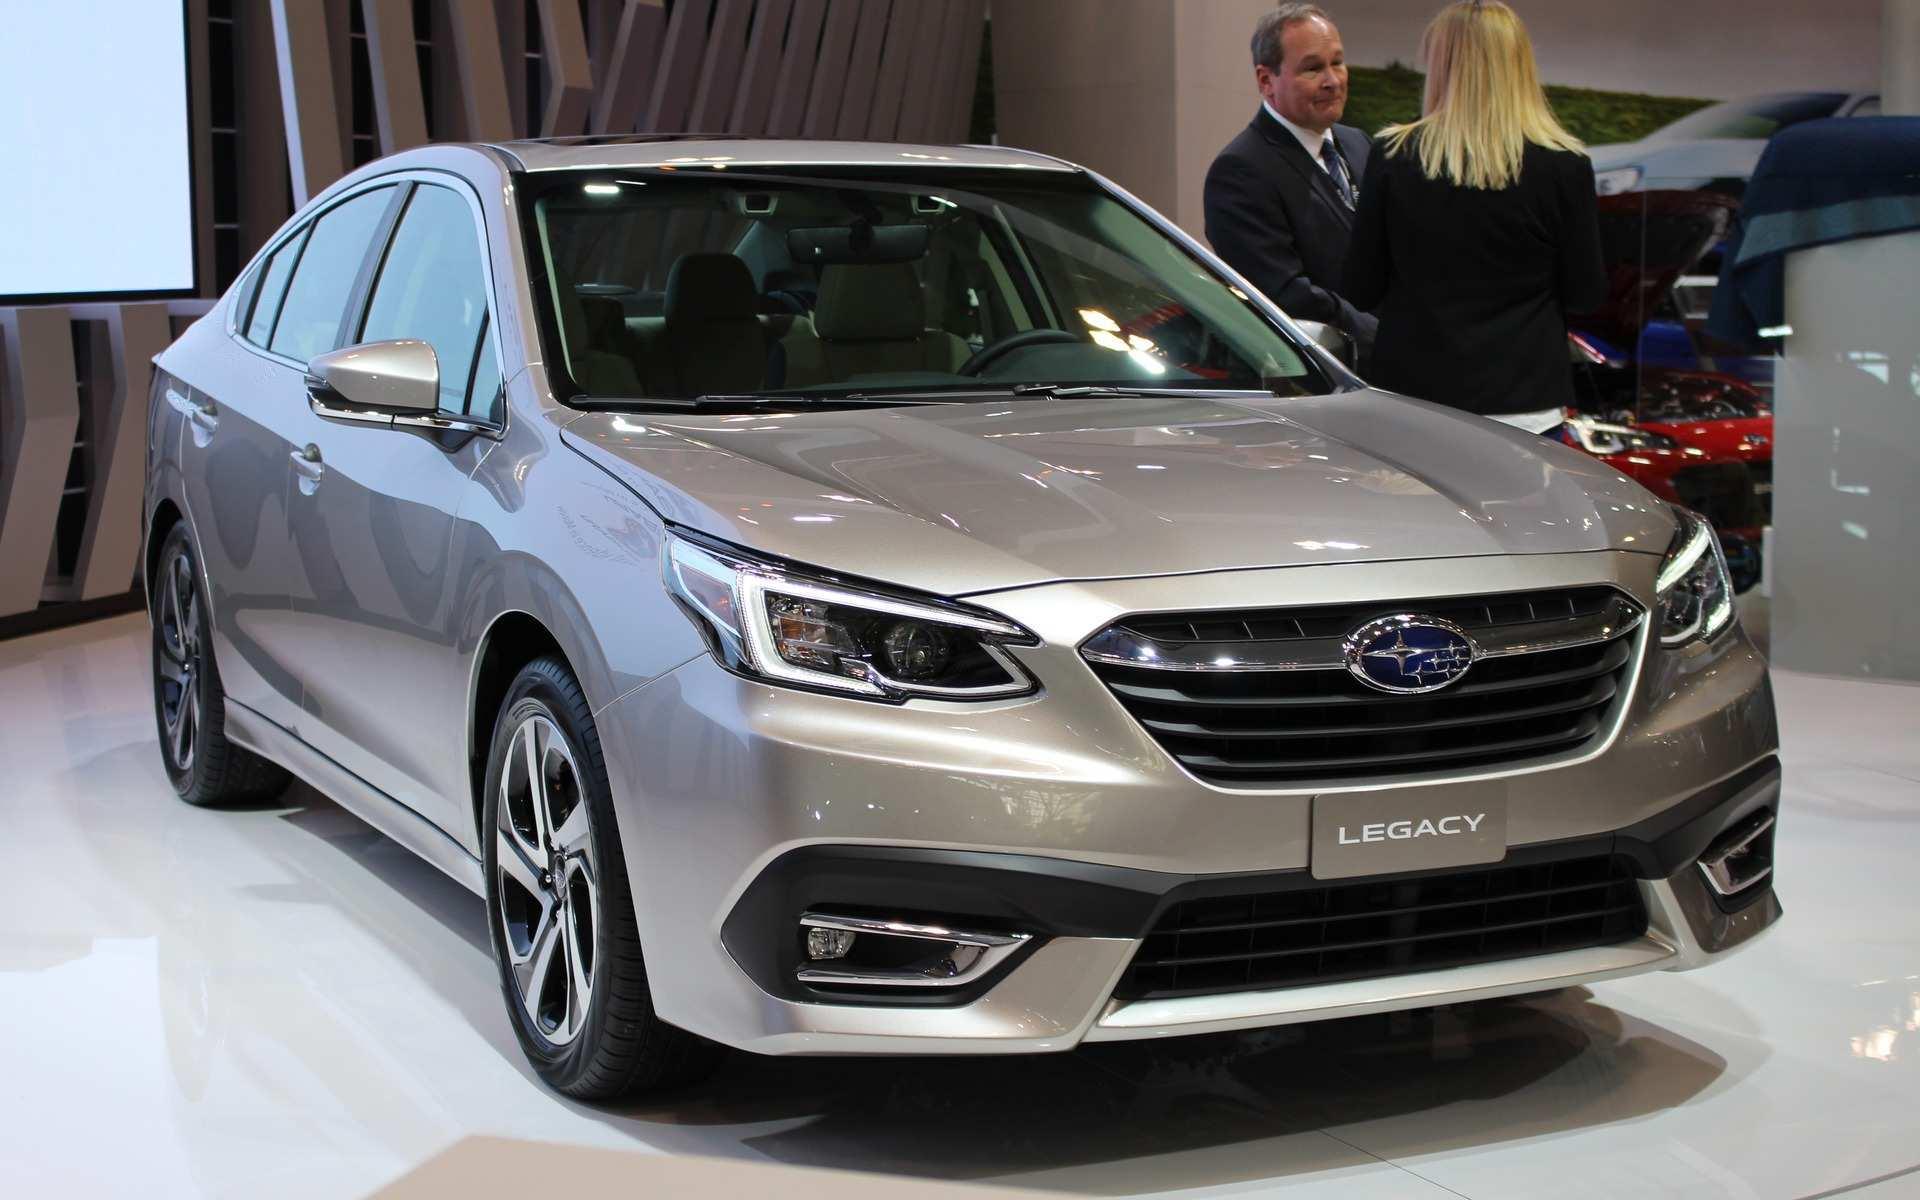 99 All New Subaru Japan 2020 Rumors with Subaru Japan 2020